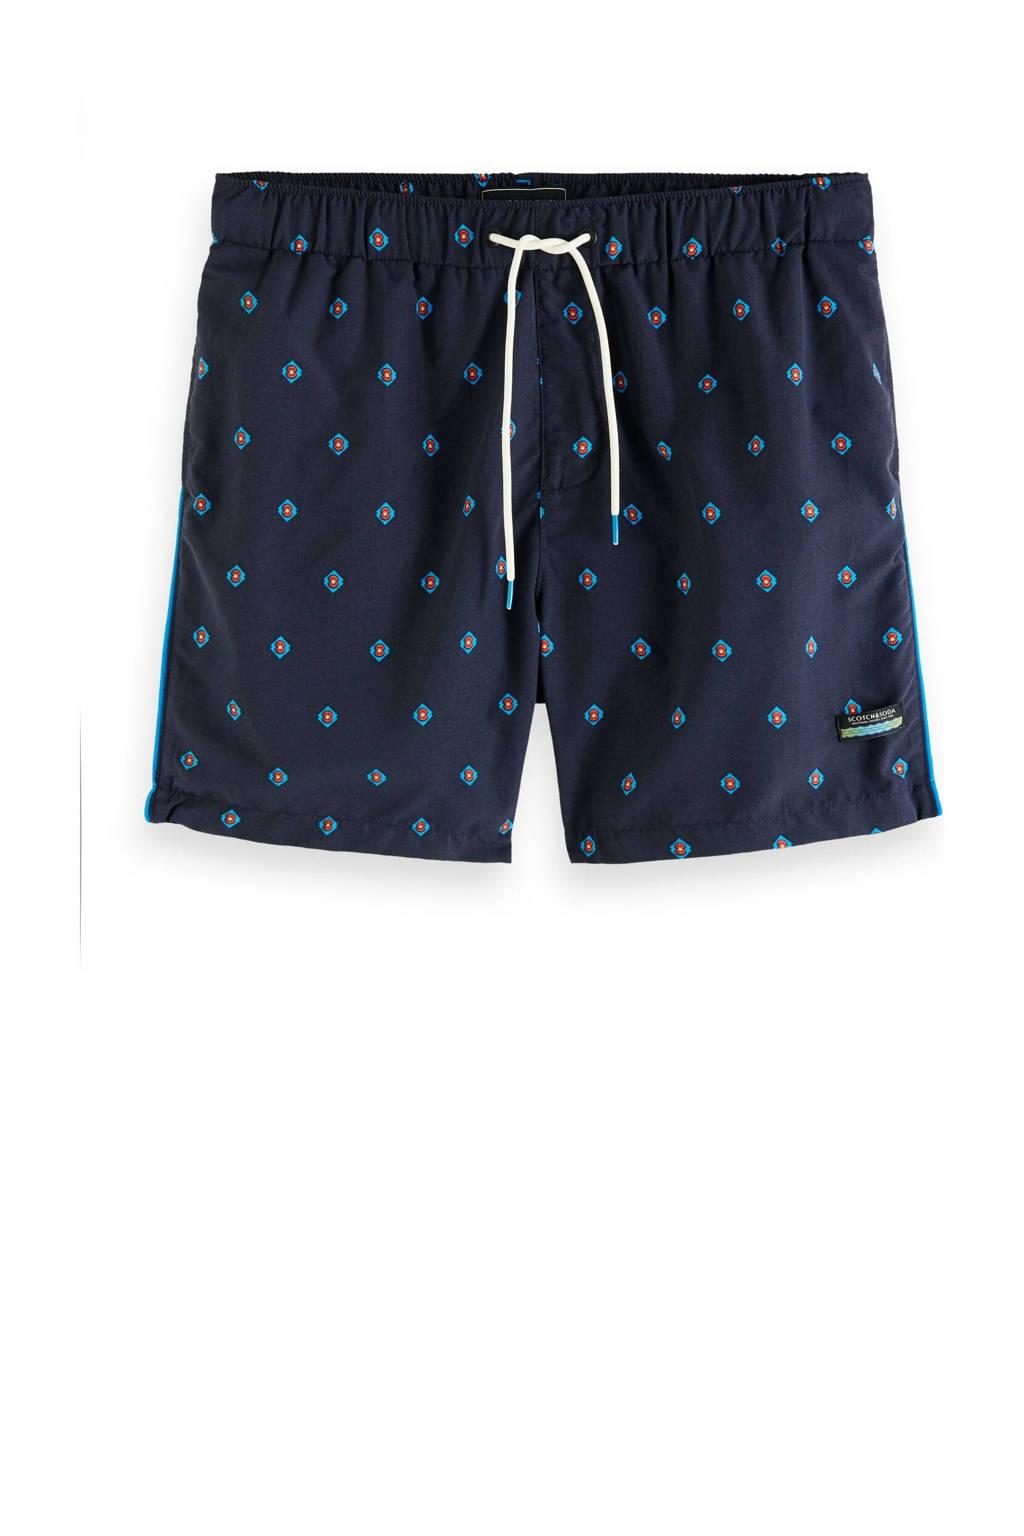 Scotch & Soda zwemshort met all over print donkerblauw, Donkerblauw